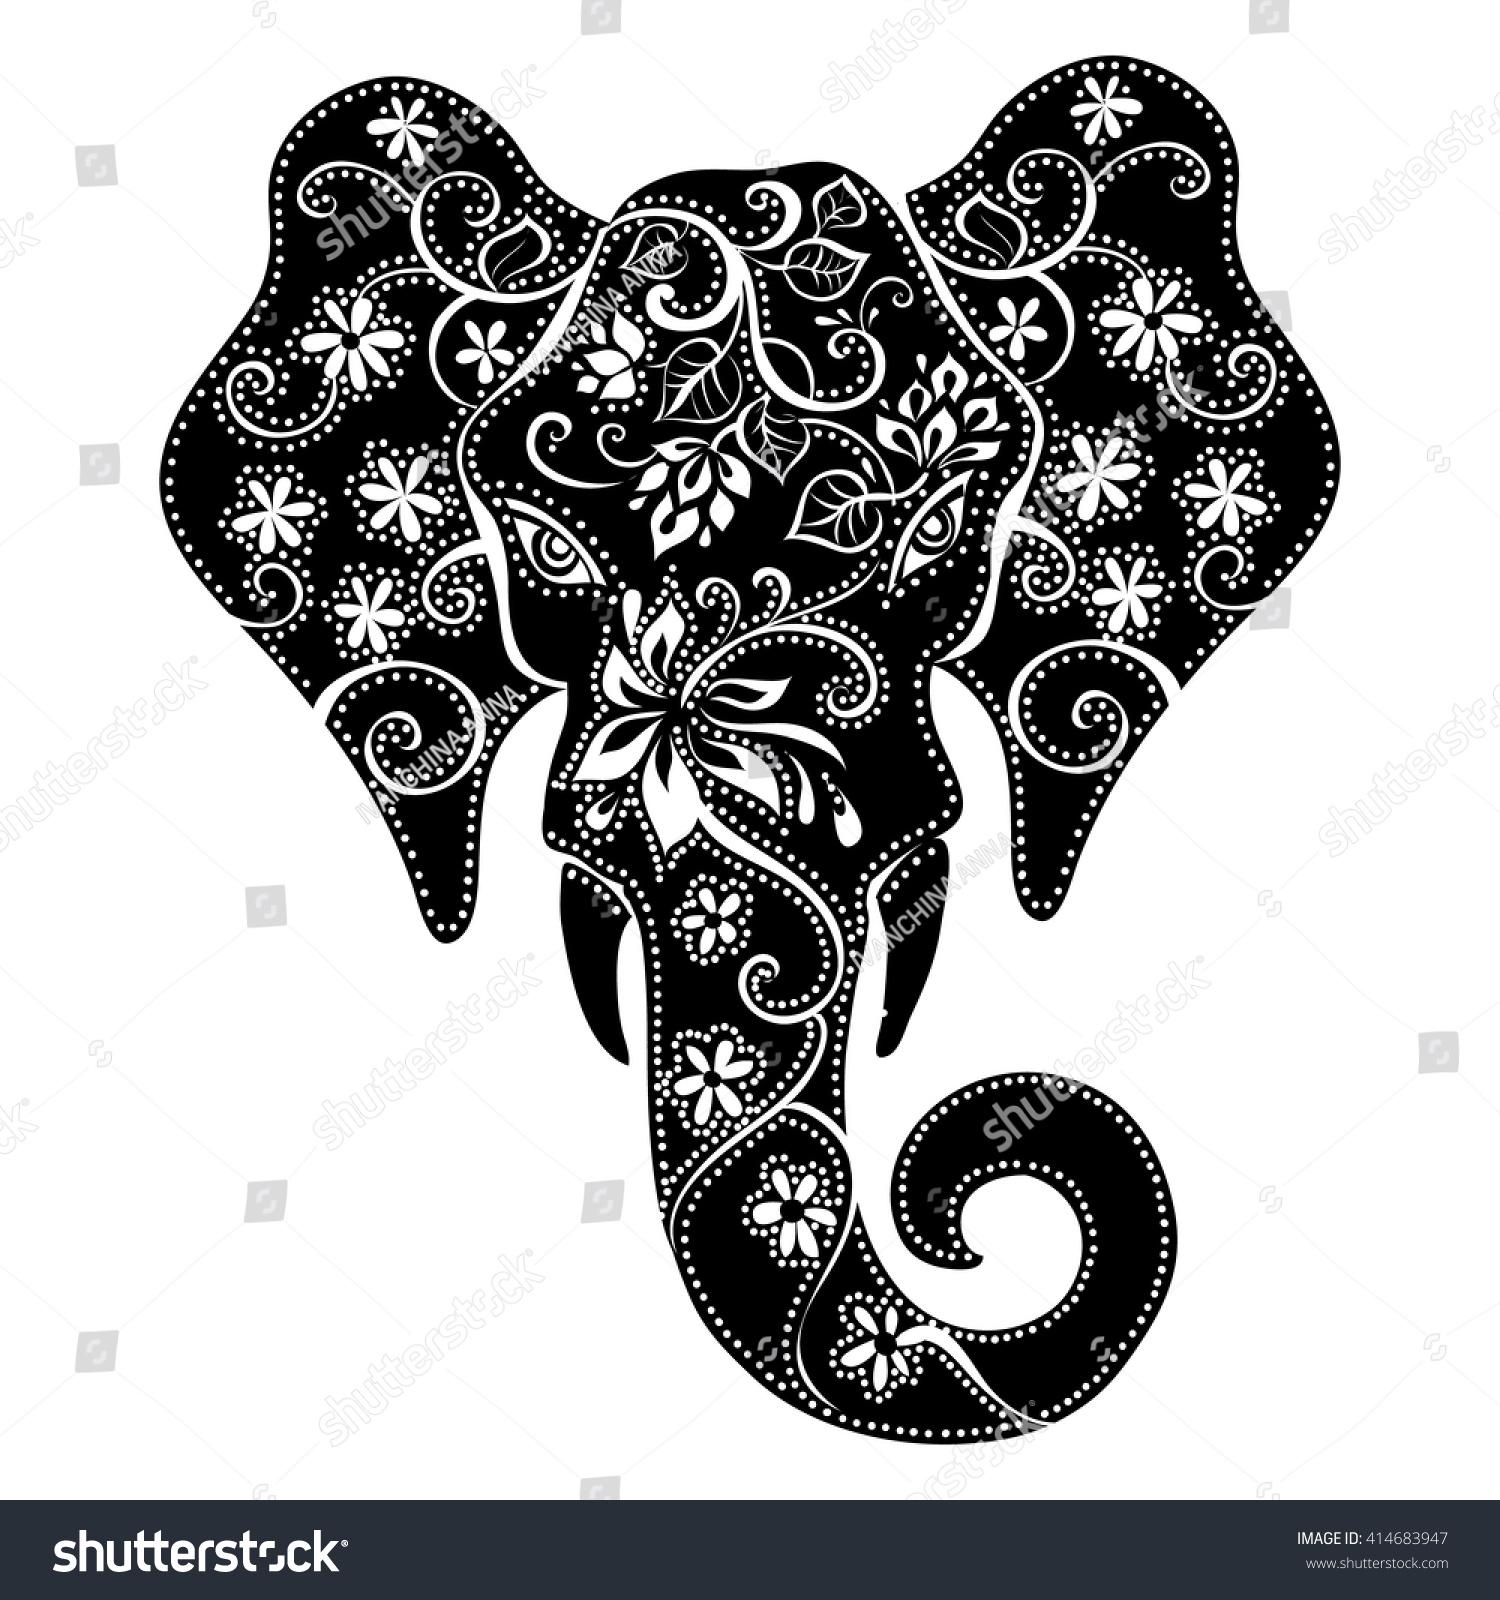 Elephant Mask Silhouette Elephant Indian Elephant Stock Vector ...